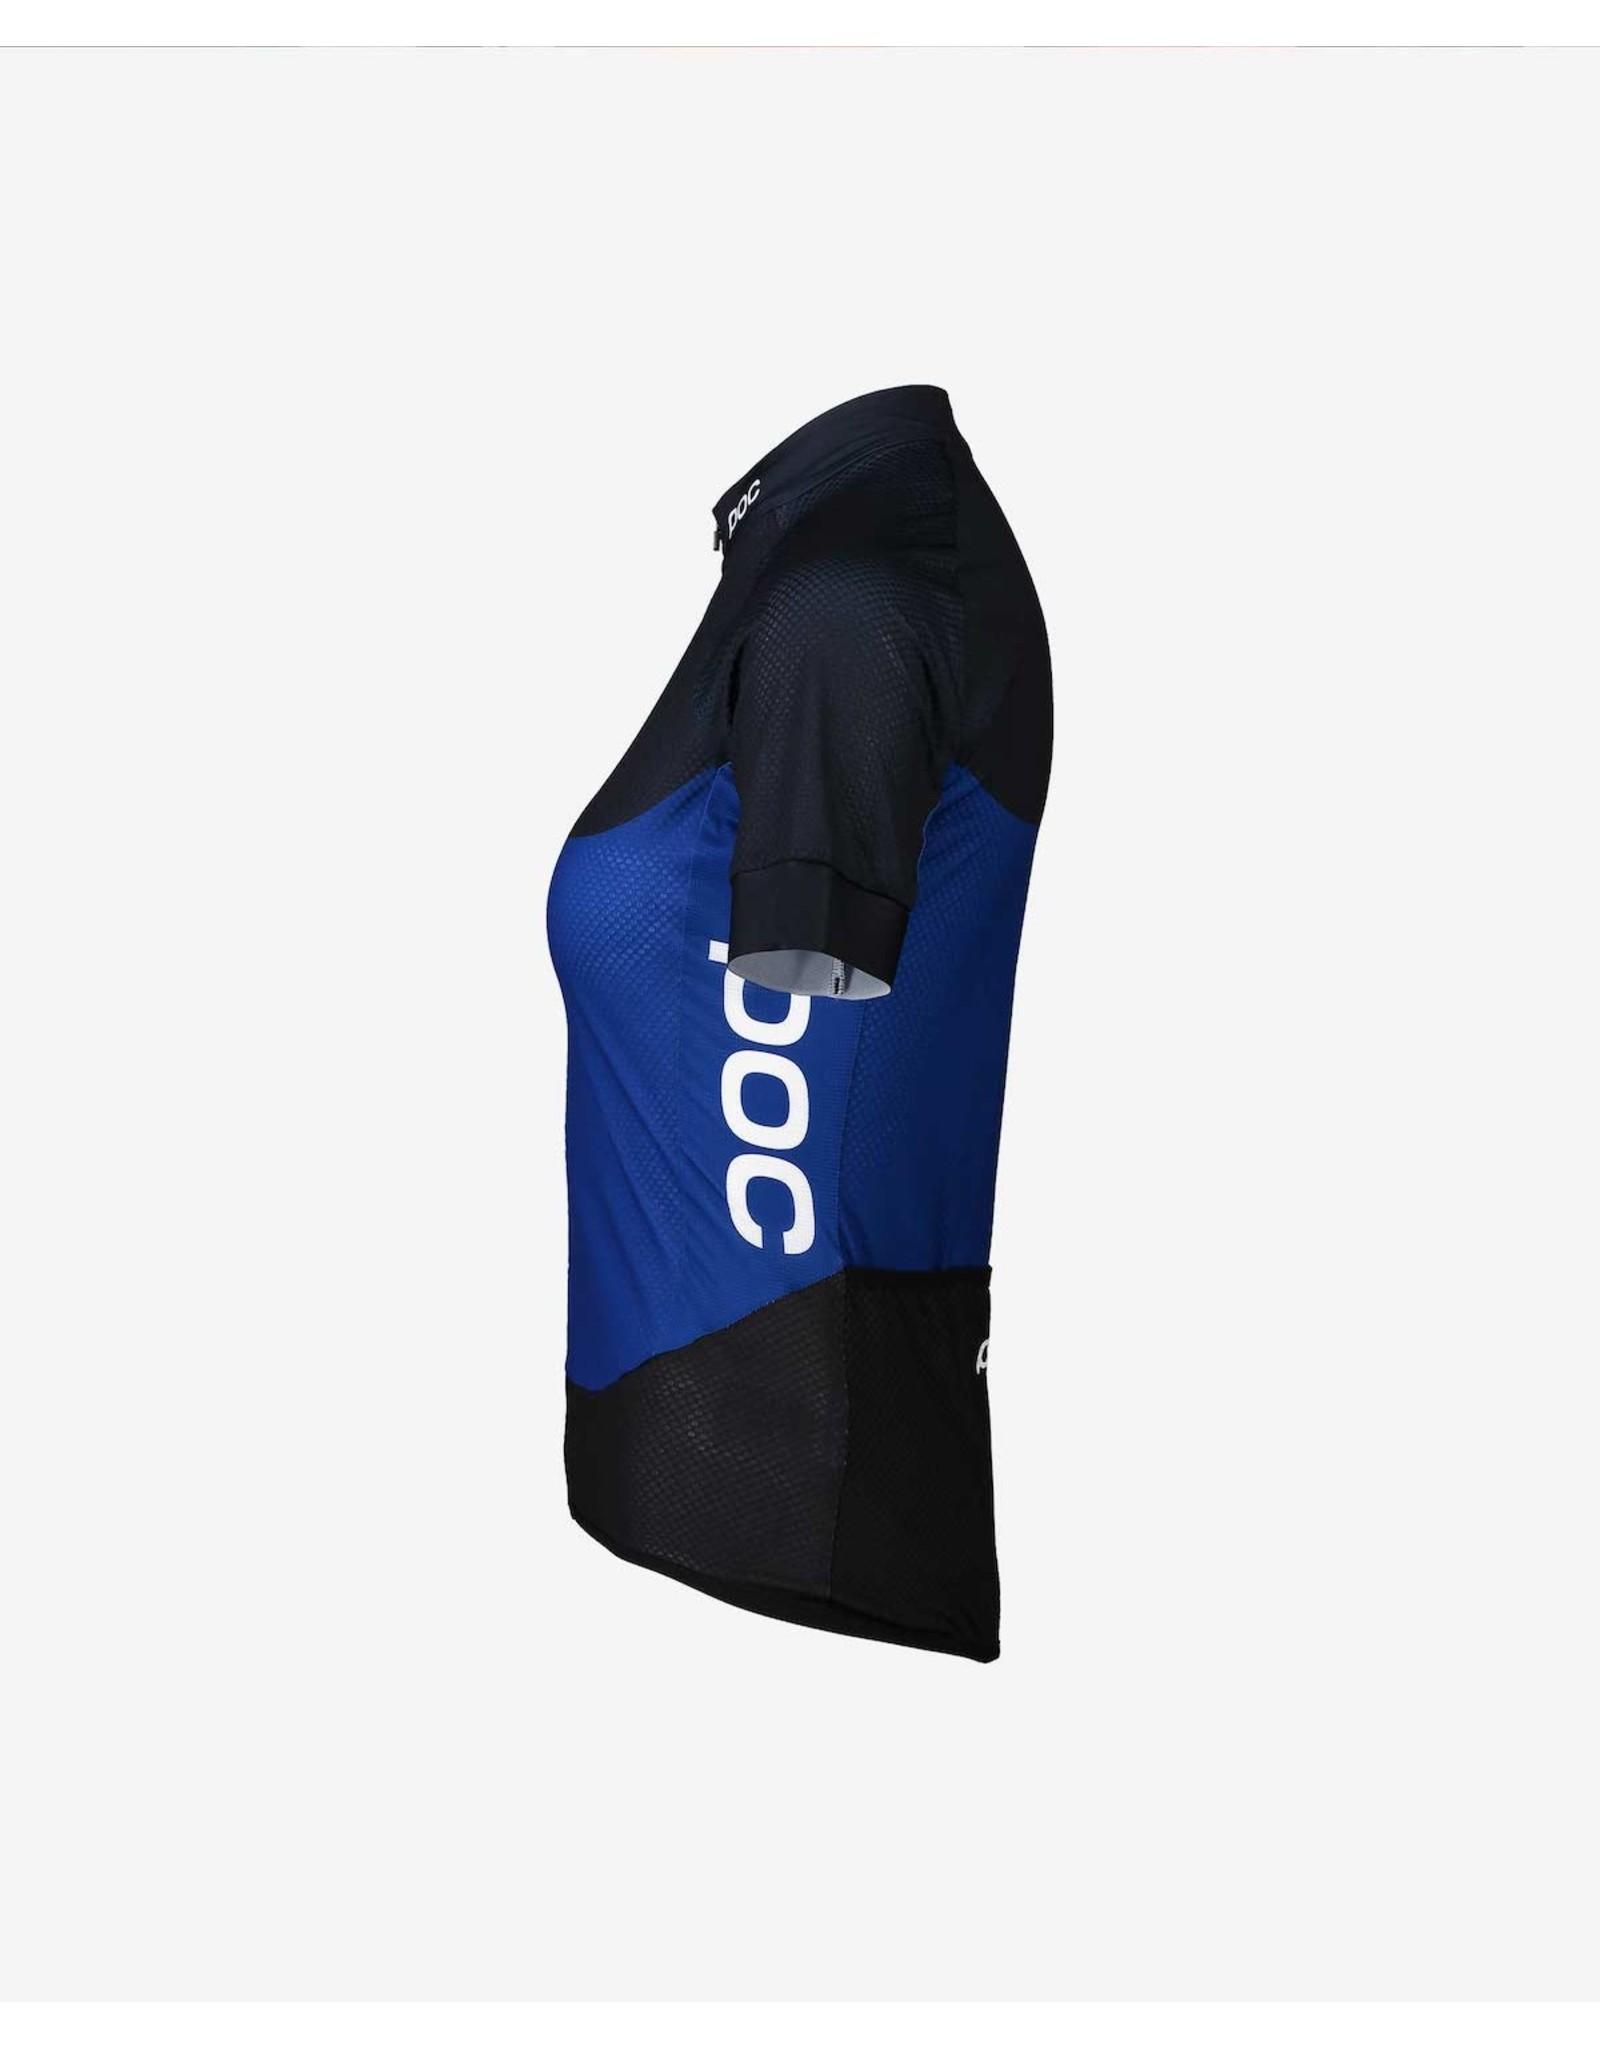 POC POC Essential Road Women's Light Jersey